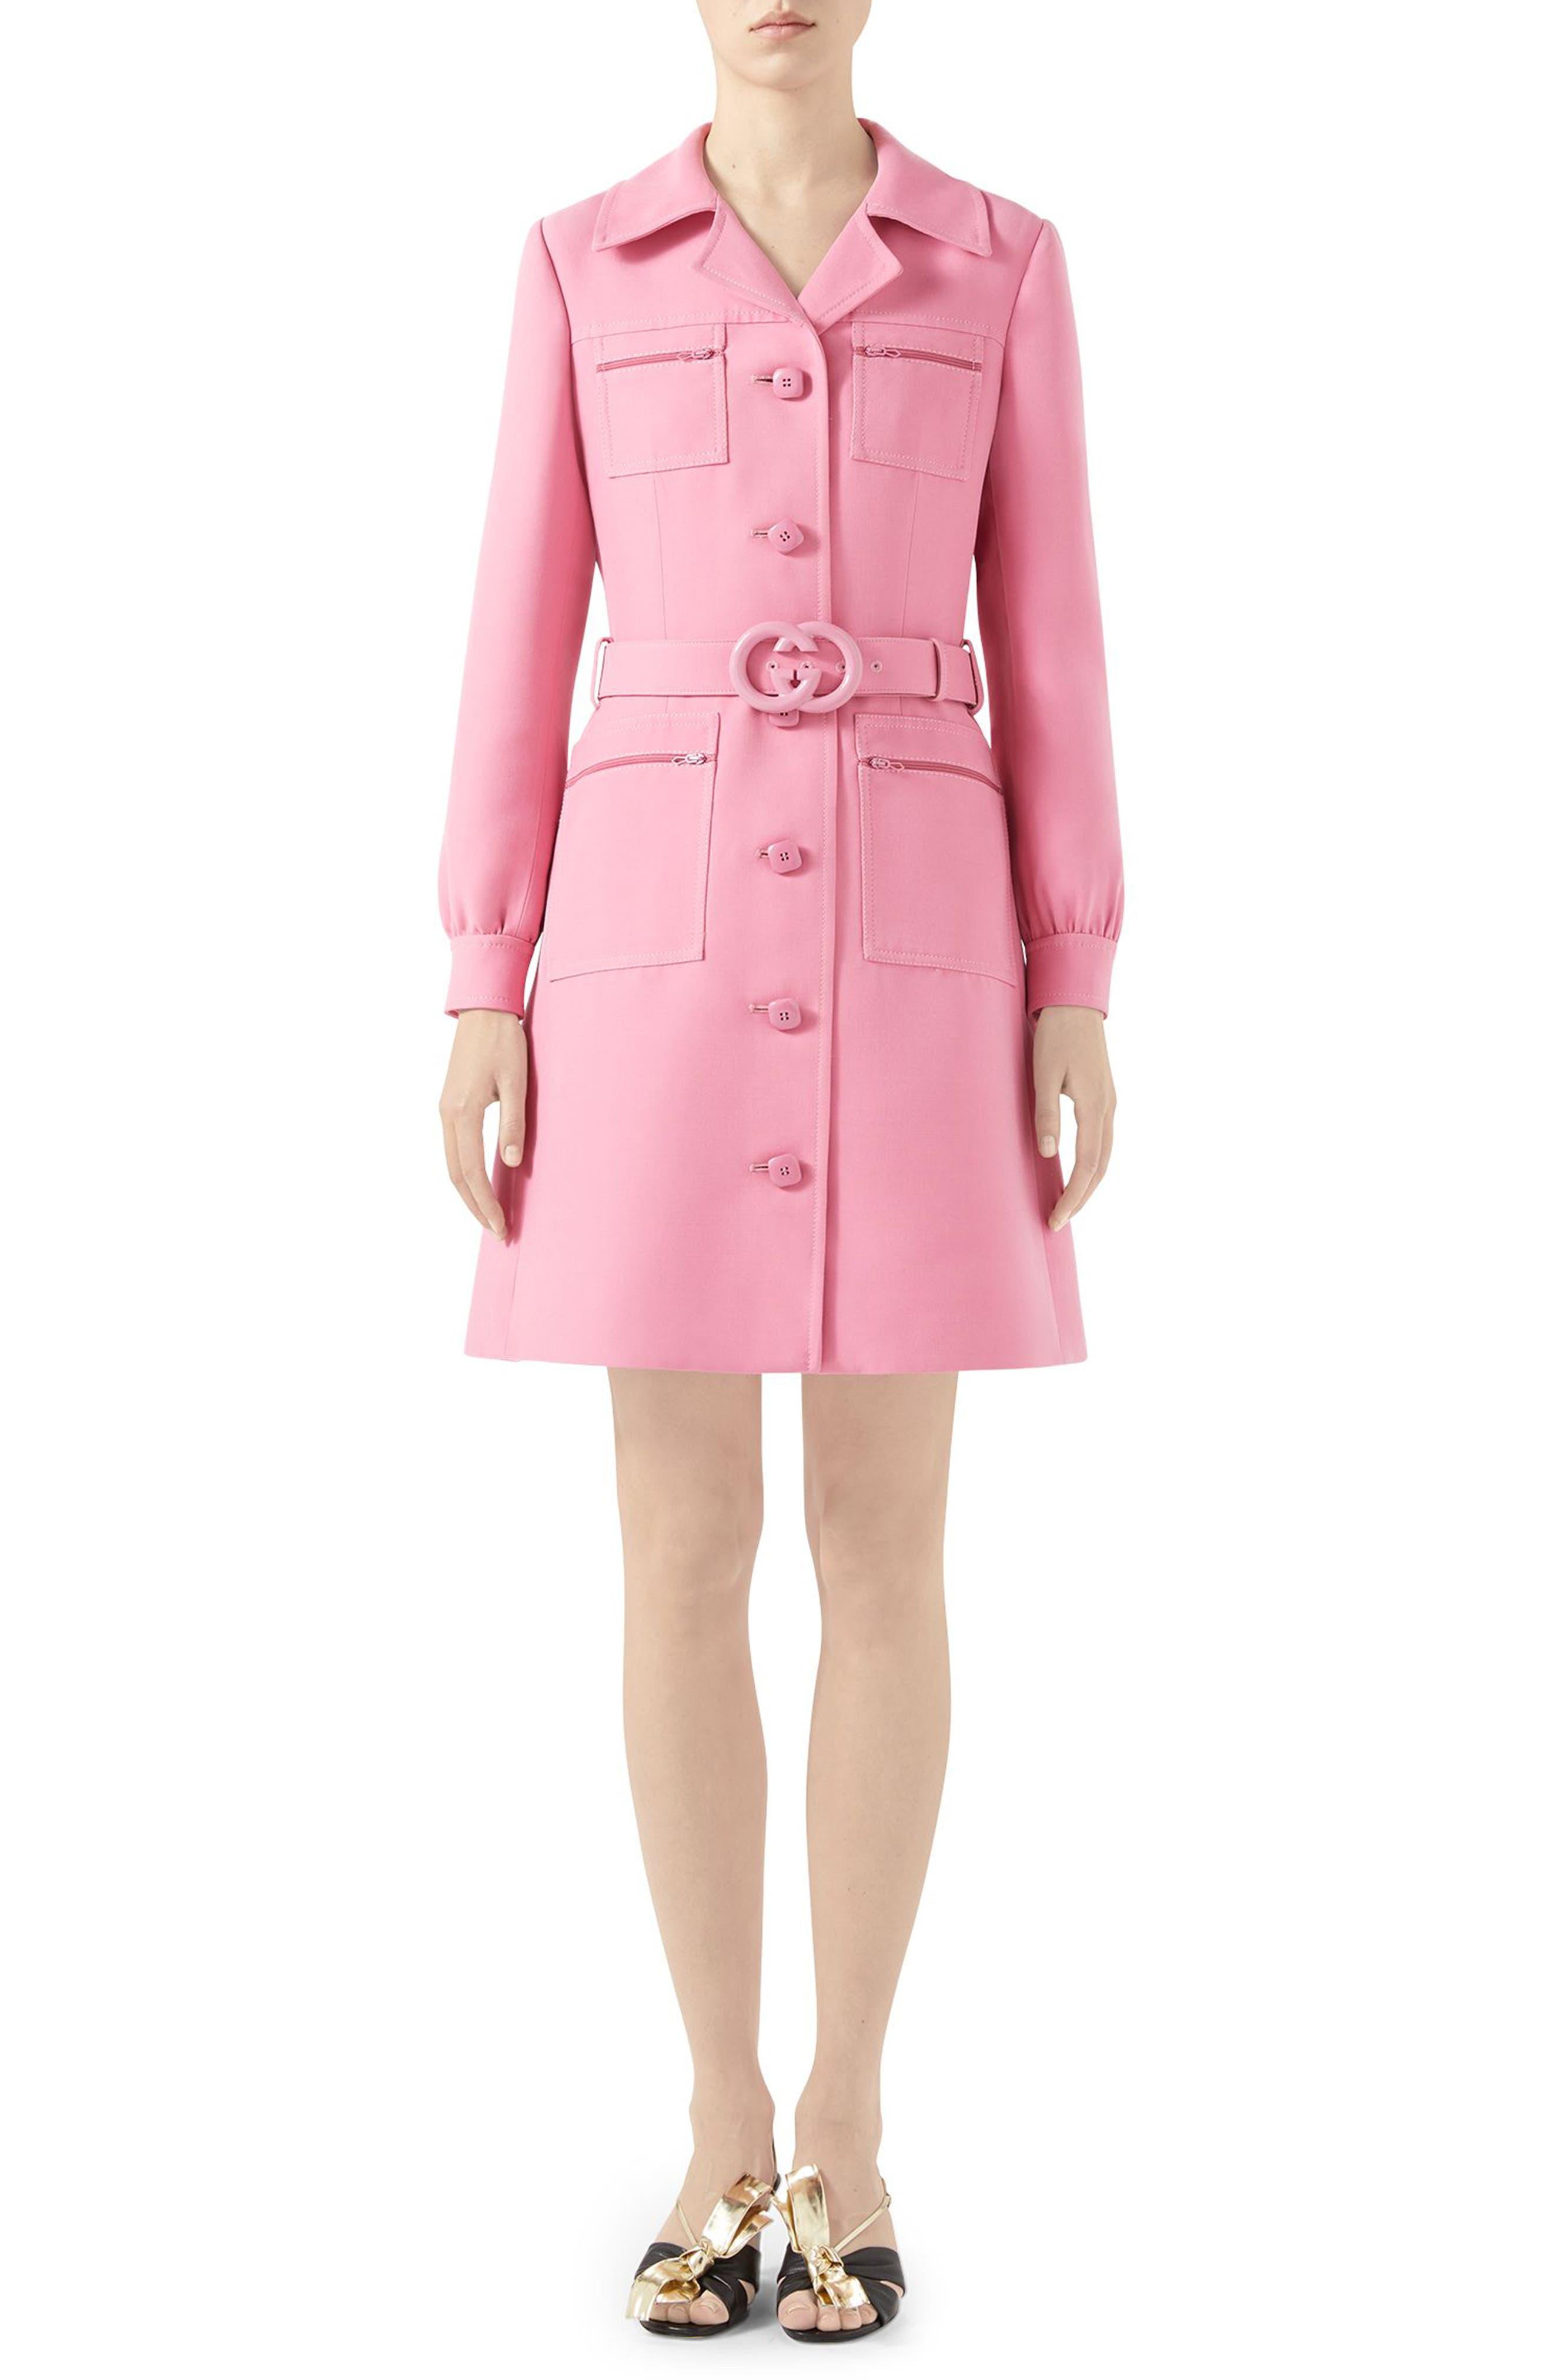 82c3378f31 Gucci Belted Cady Crepe Dress Coat, US / 40 IT - Pink